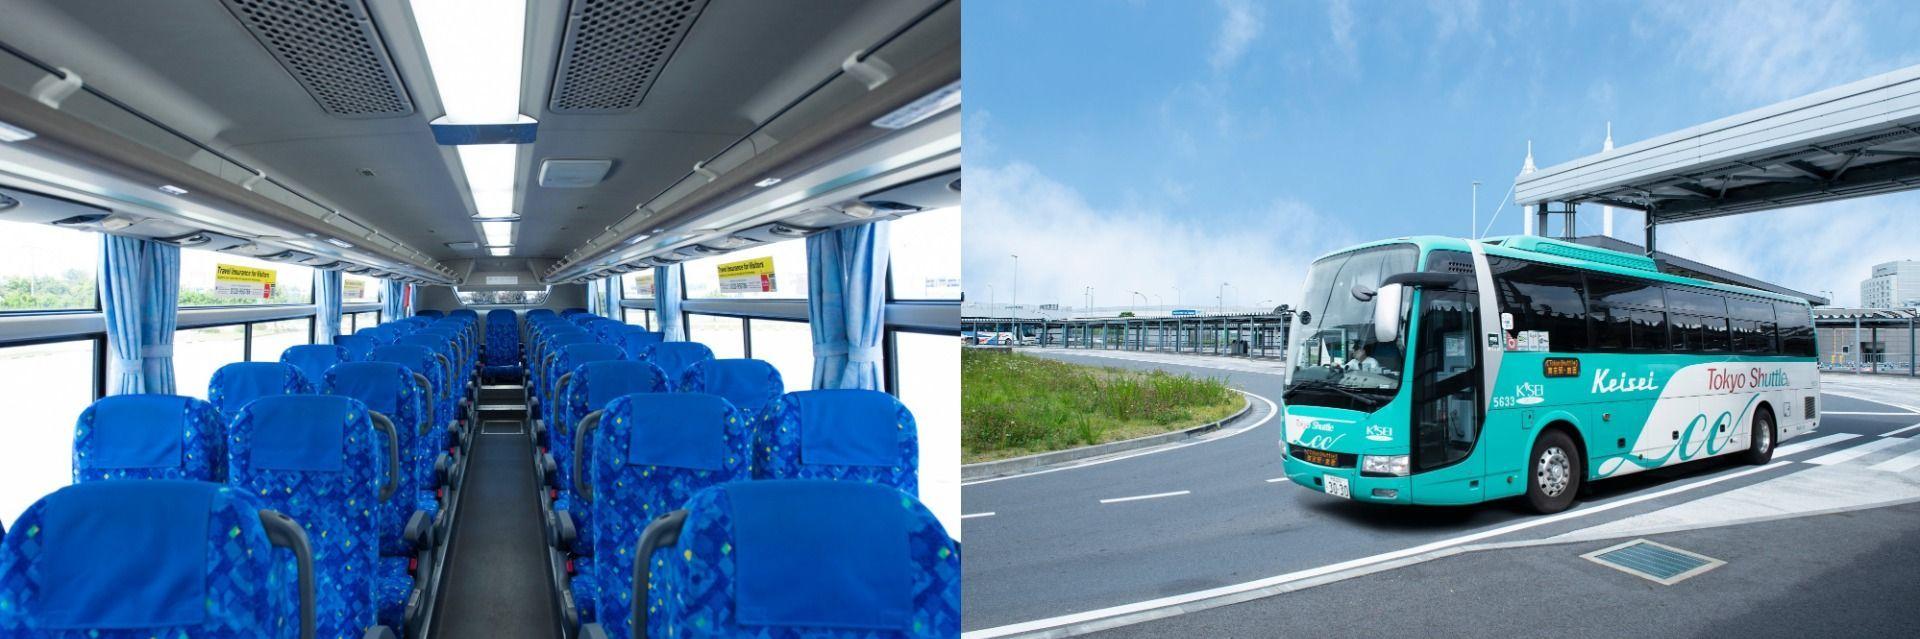 Tokyo Shuttle(moving between Tokyo Station and Narita International Airport)